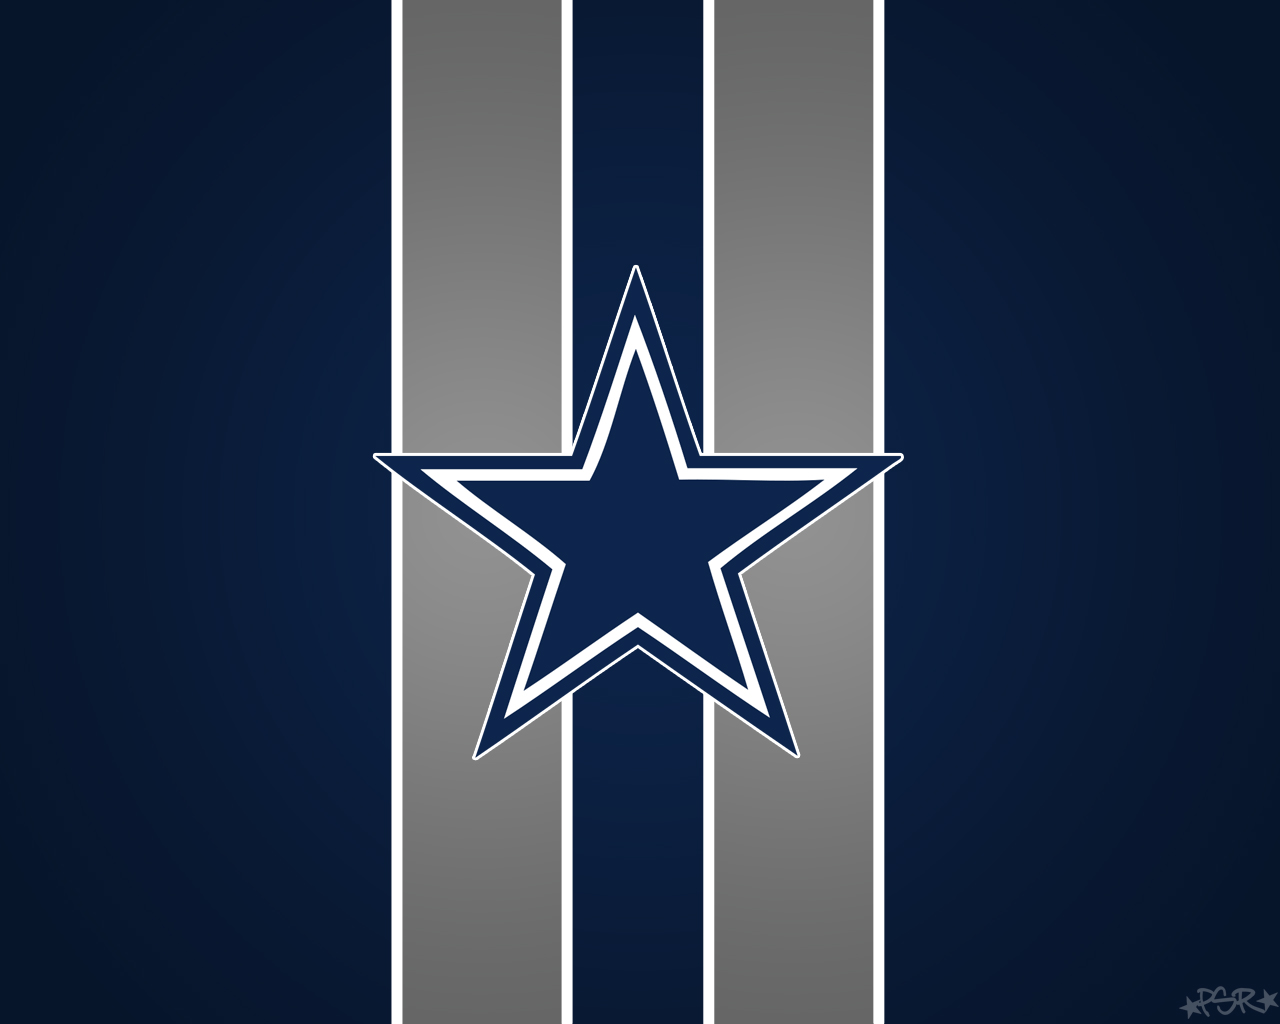 Dallas Cowboys Wallpapers Download PixelsTalk Dallas Cowboys 1280x1024